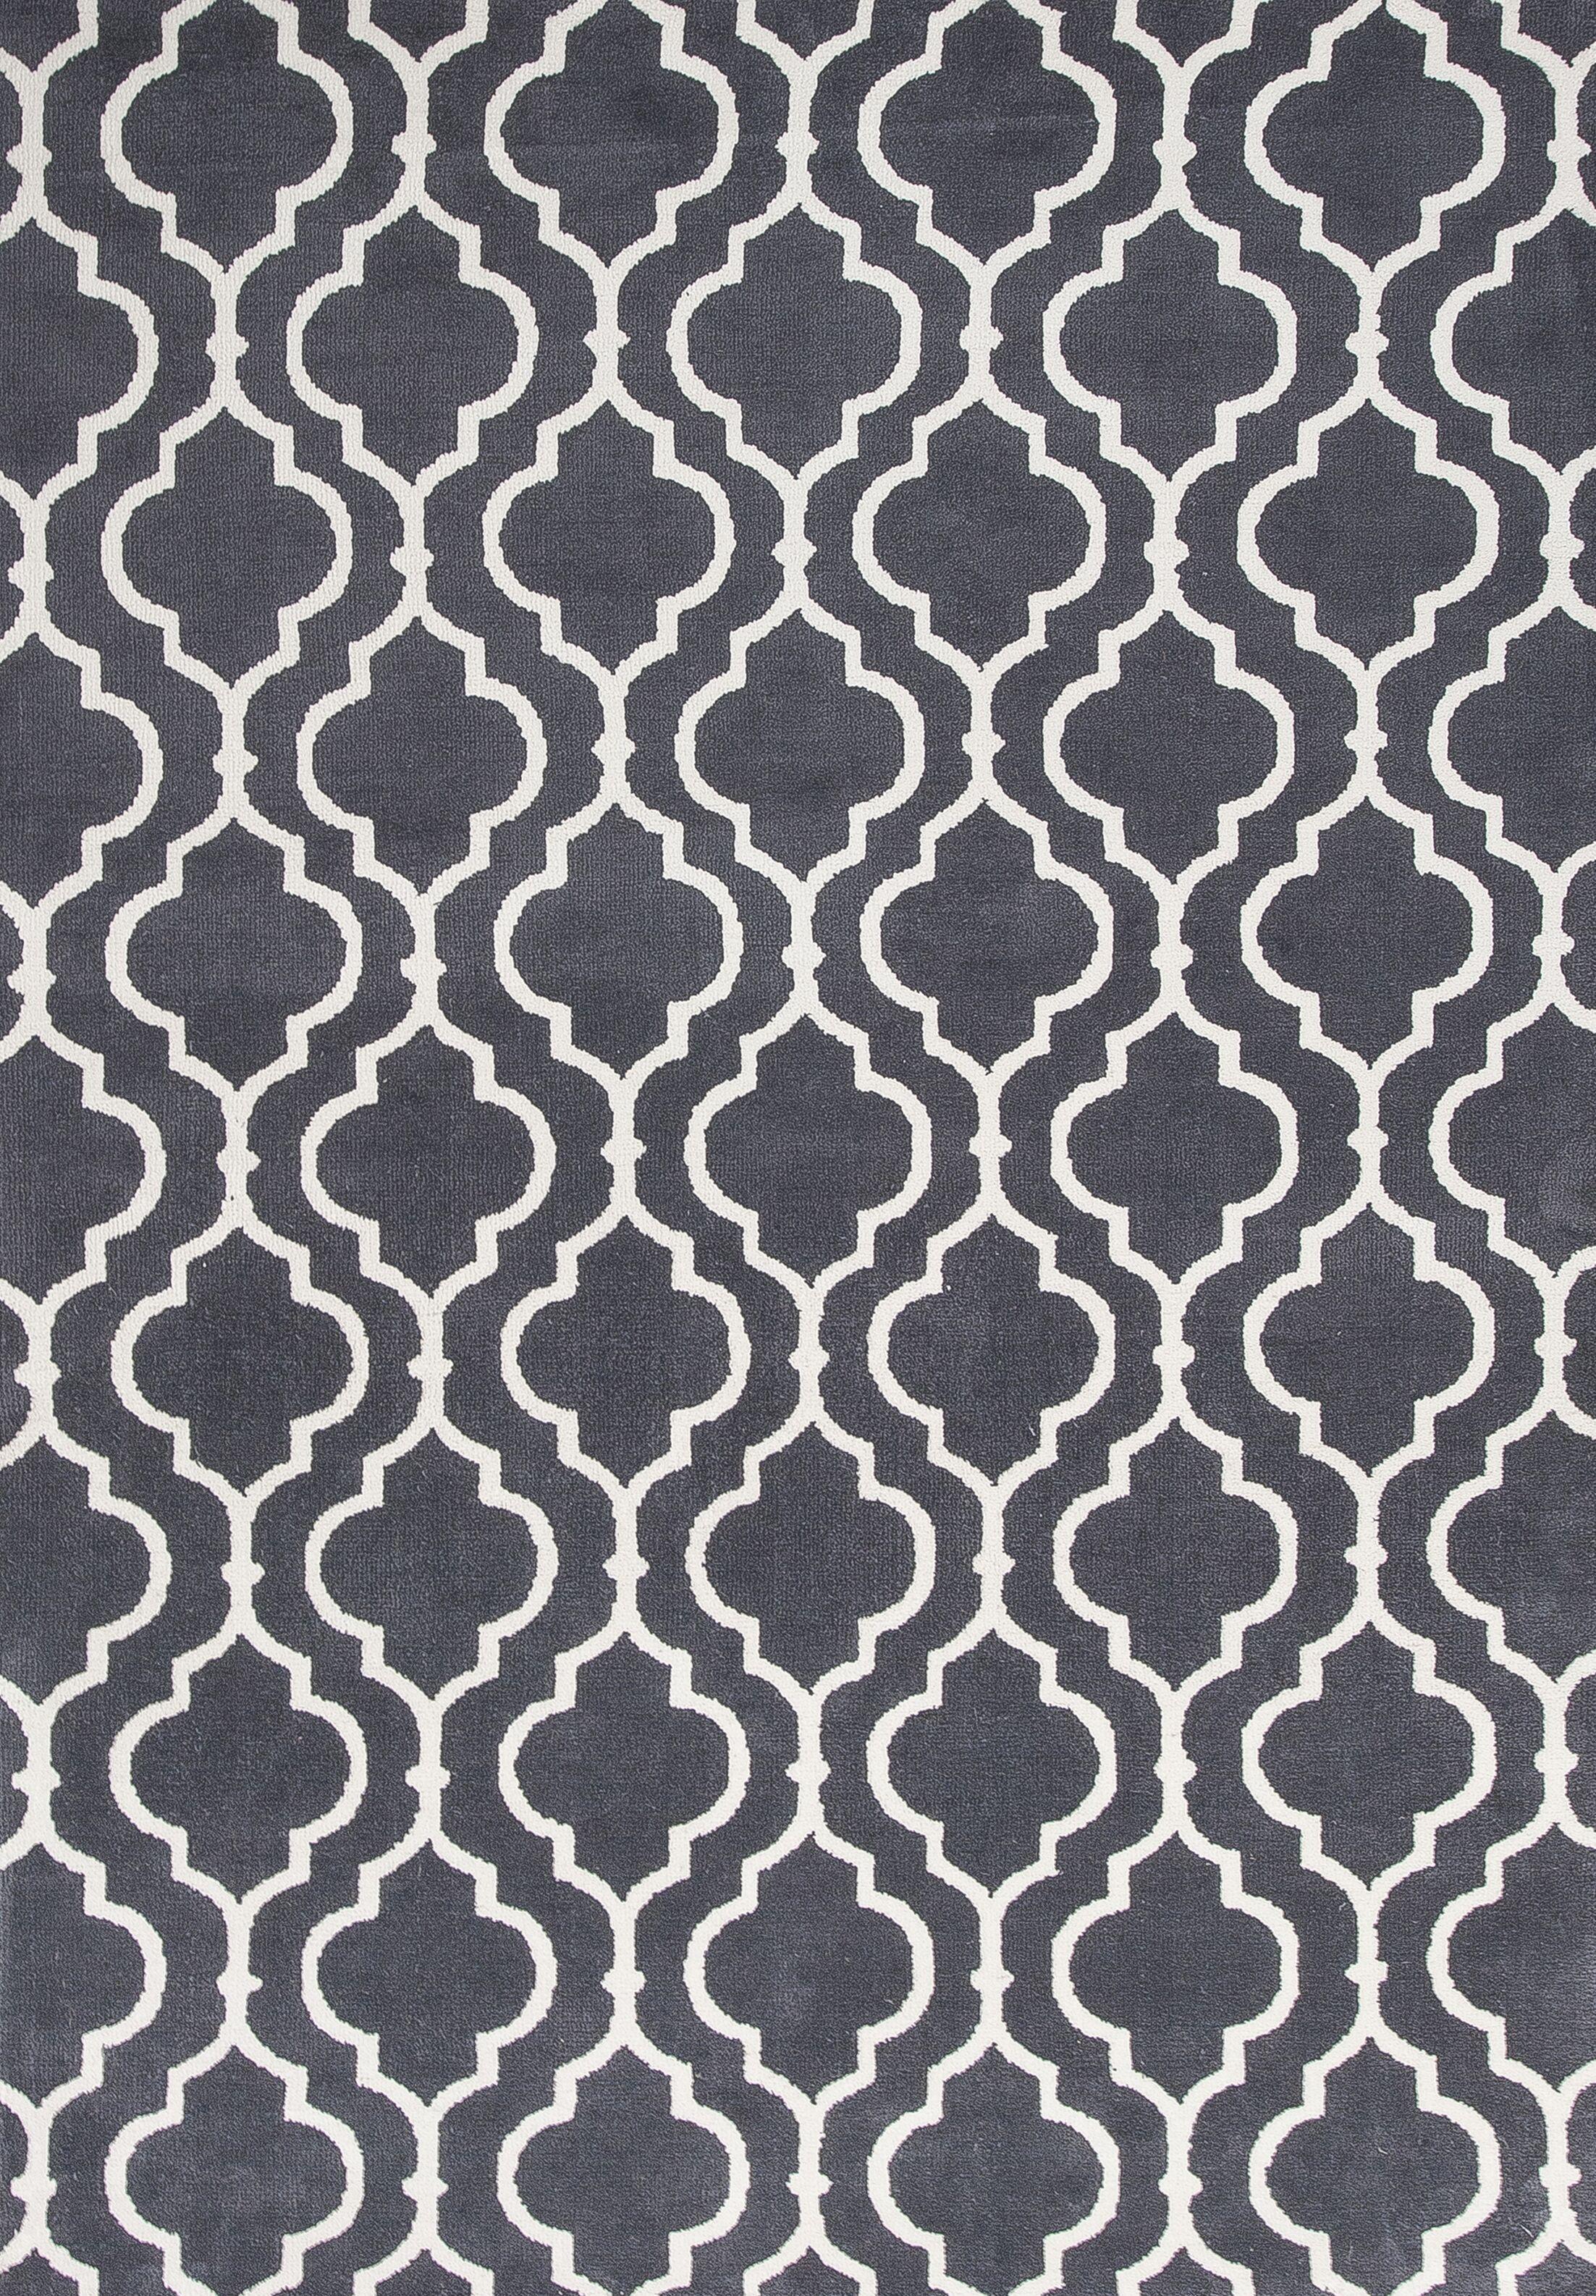 Blythewood Hand Woven Charcoal Area Rug Rug Size: 3'3